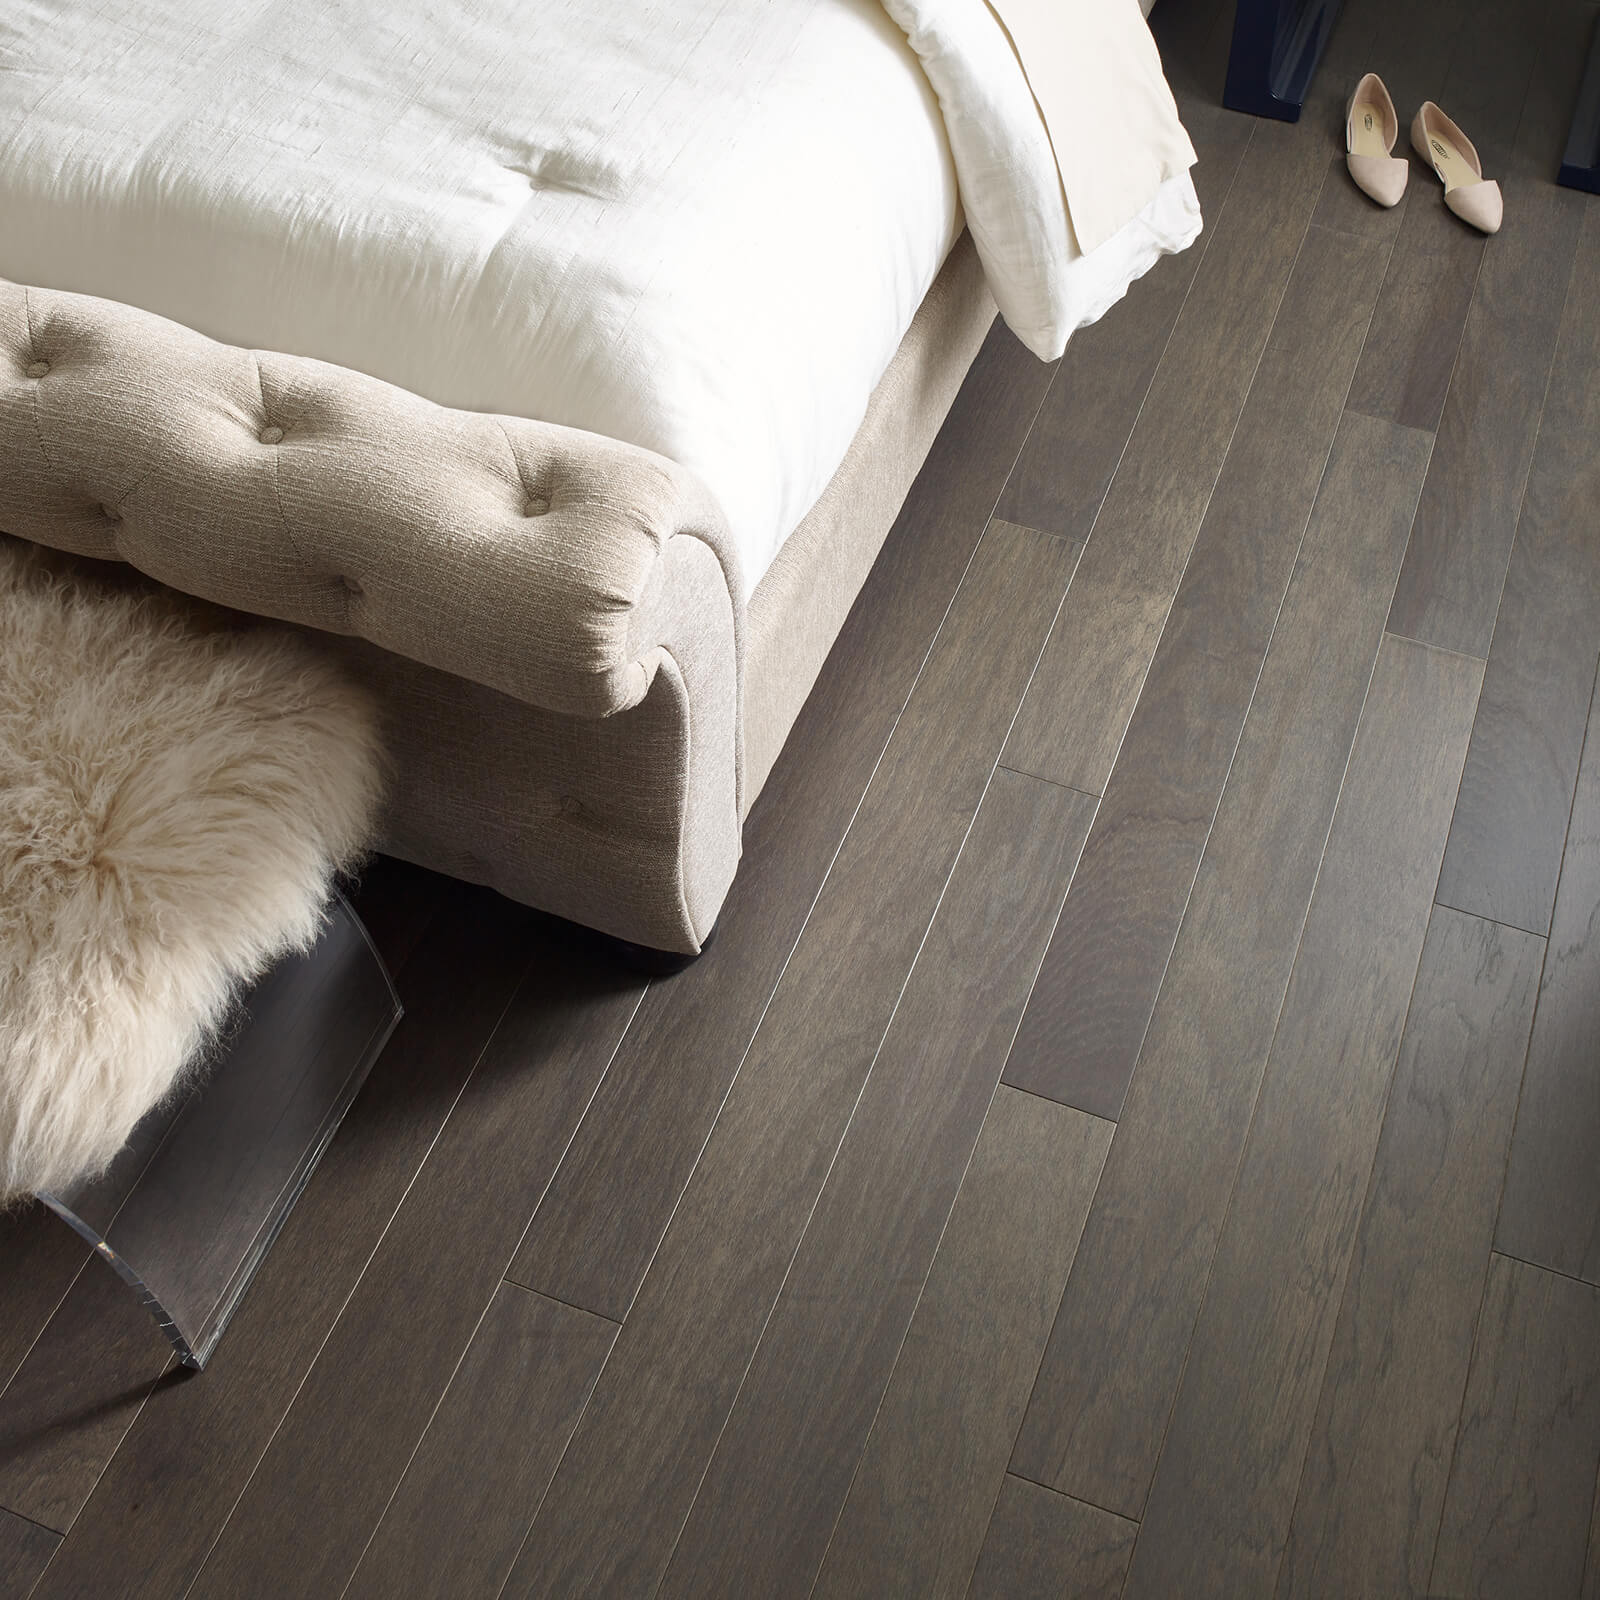 Northington smooth flooring | Gilman Floors